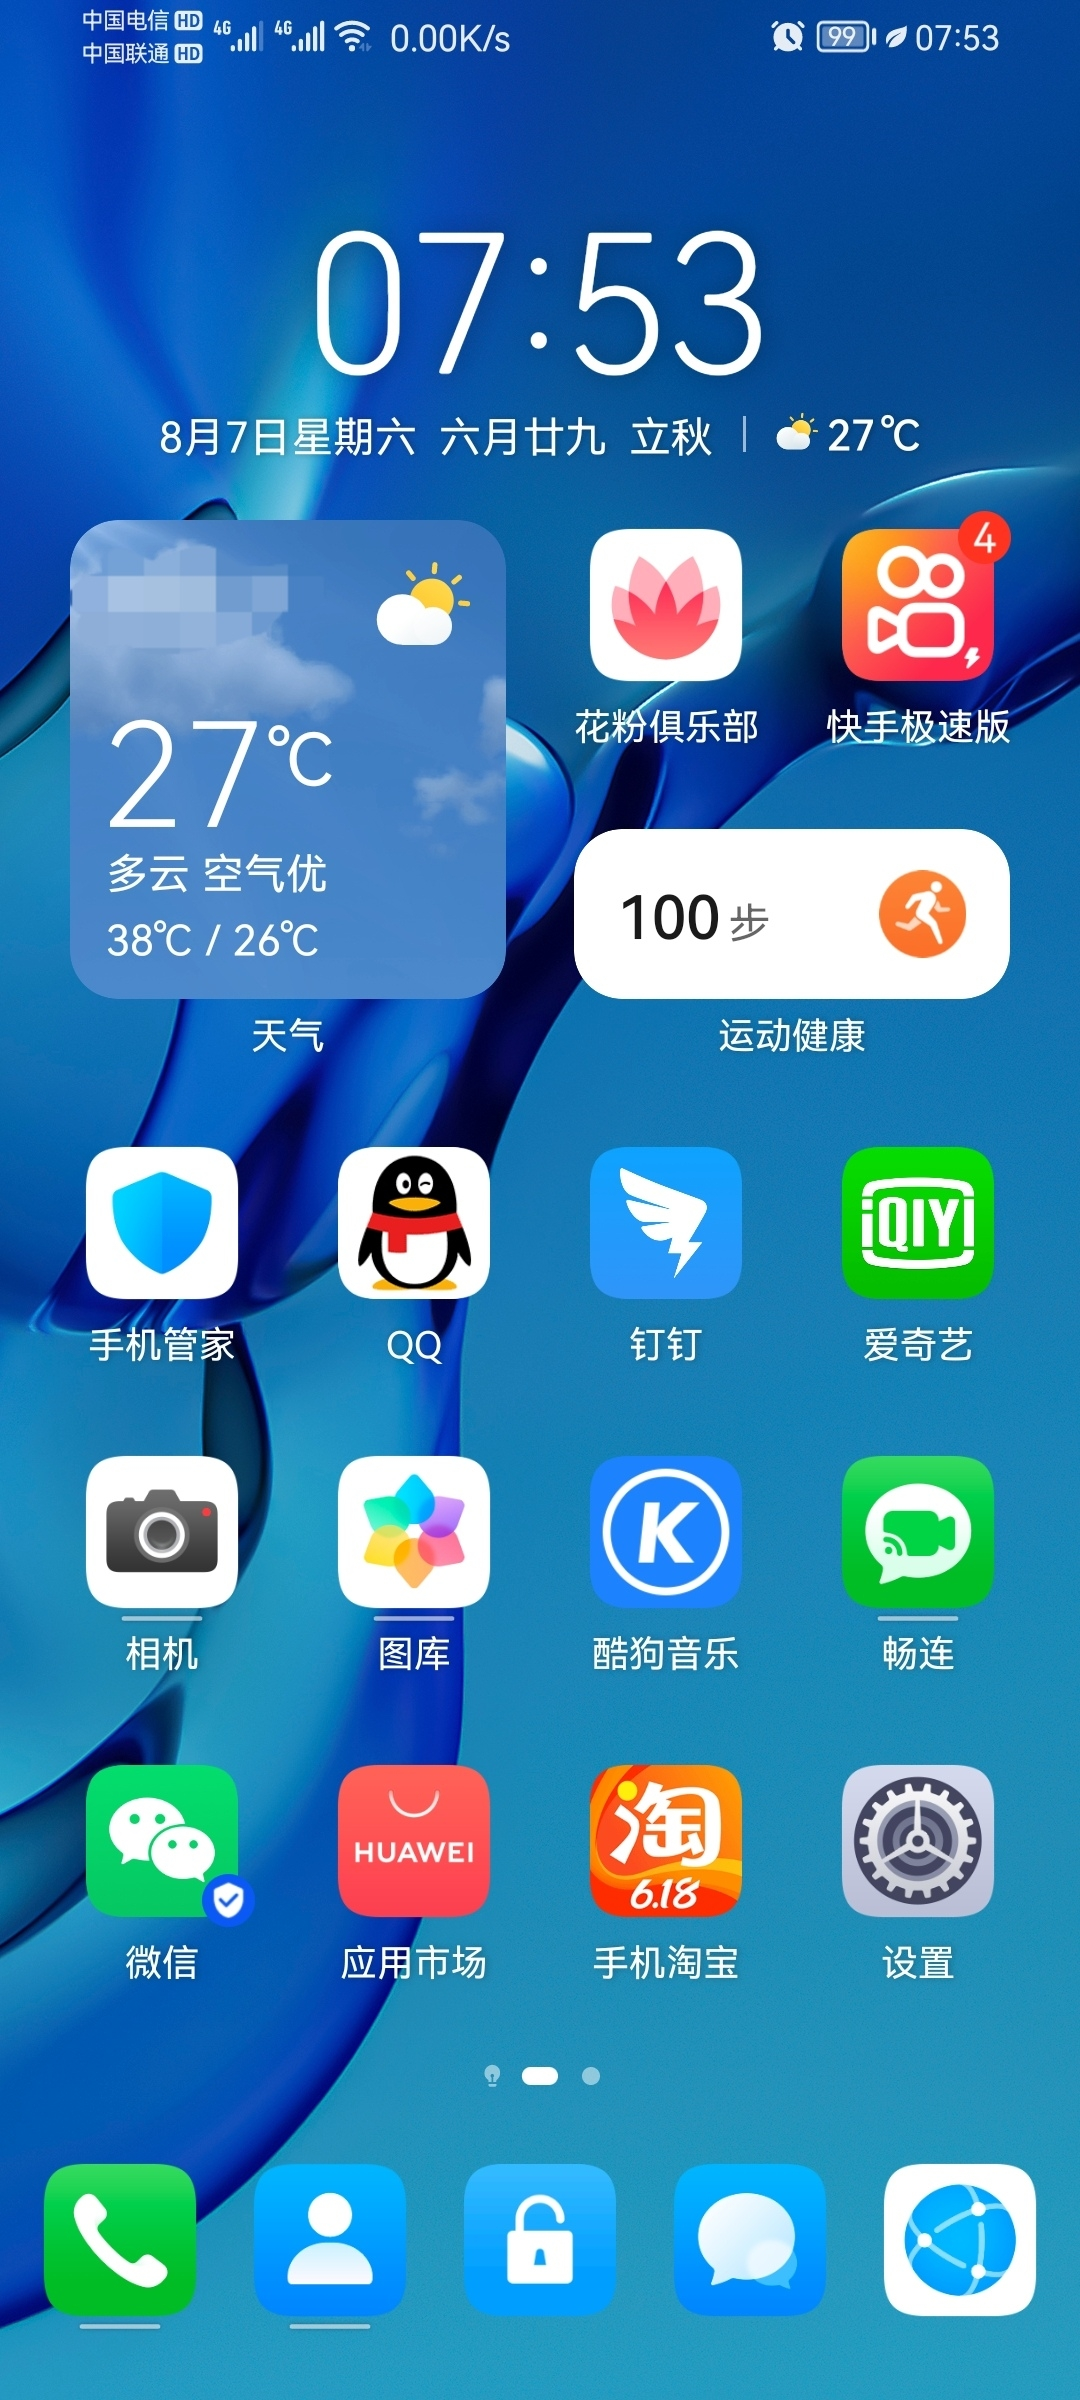 Screenshot_20210807_075352_com.huawei.android.launcher_edit_16310580467302.jpg